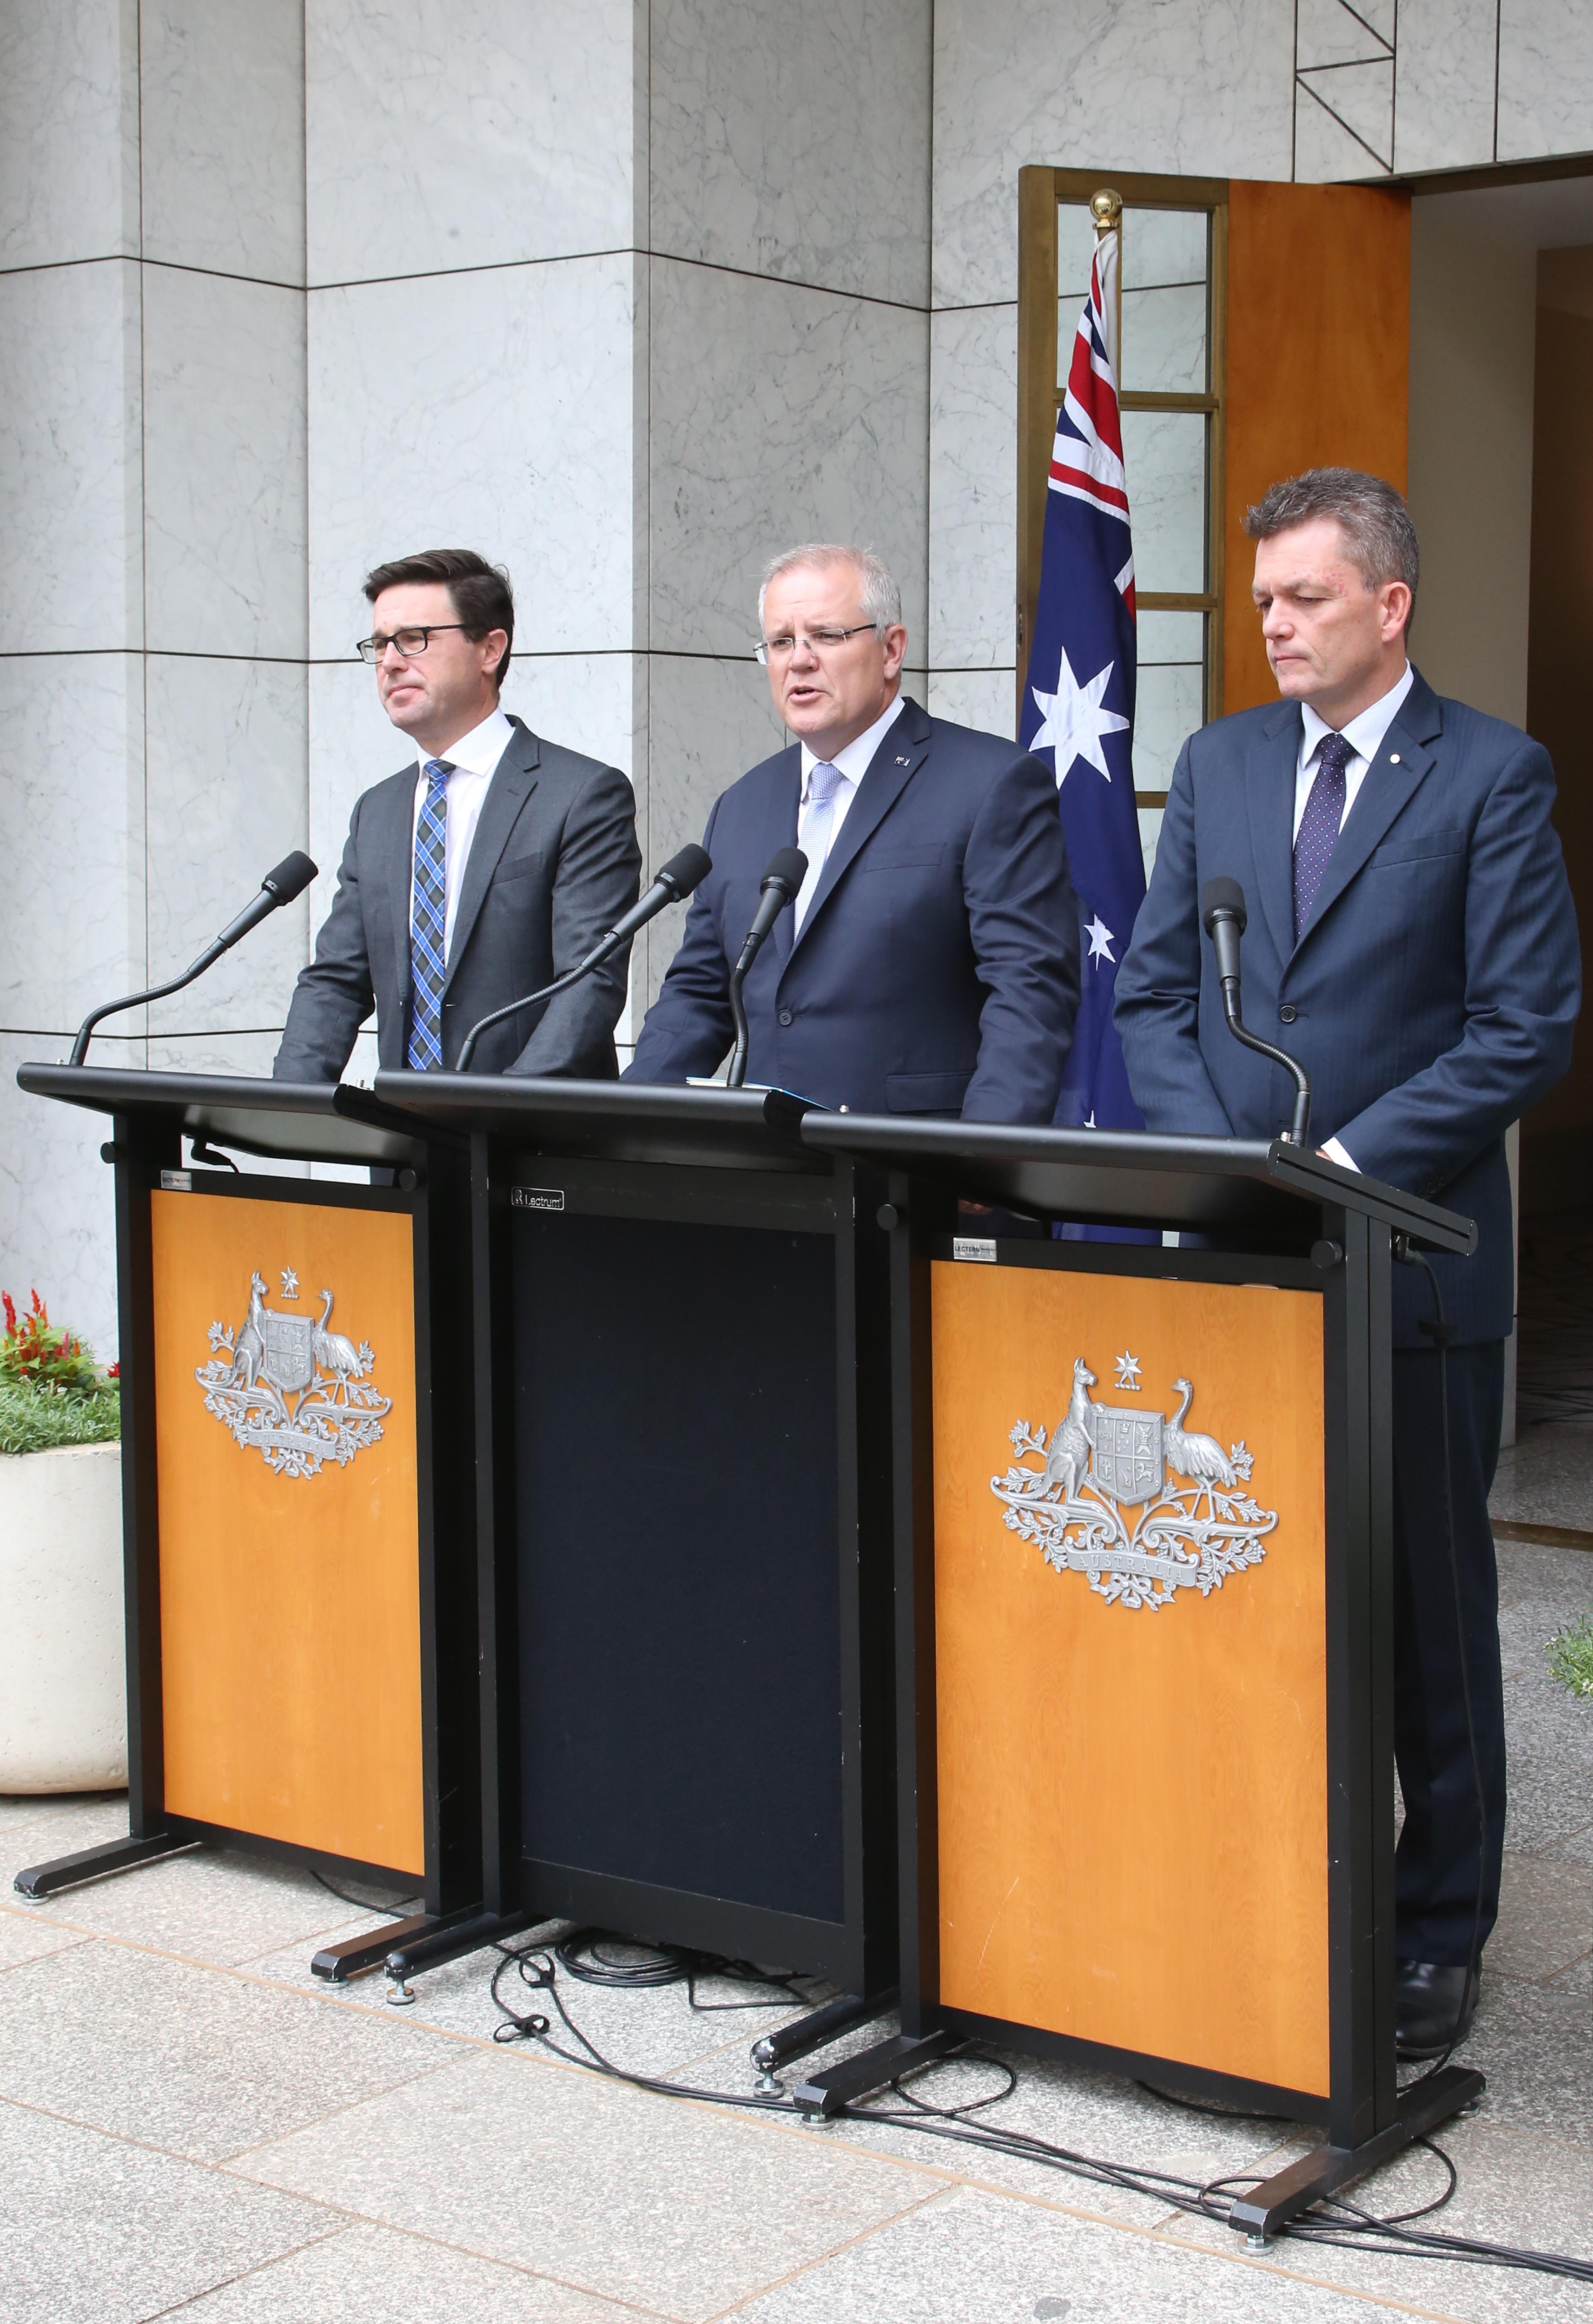 Australians on SE coast urged to flee as fire risk escalates